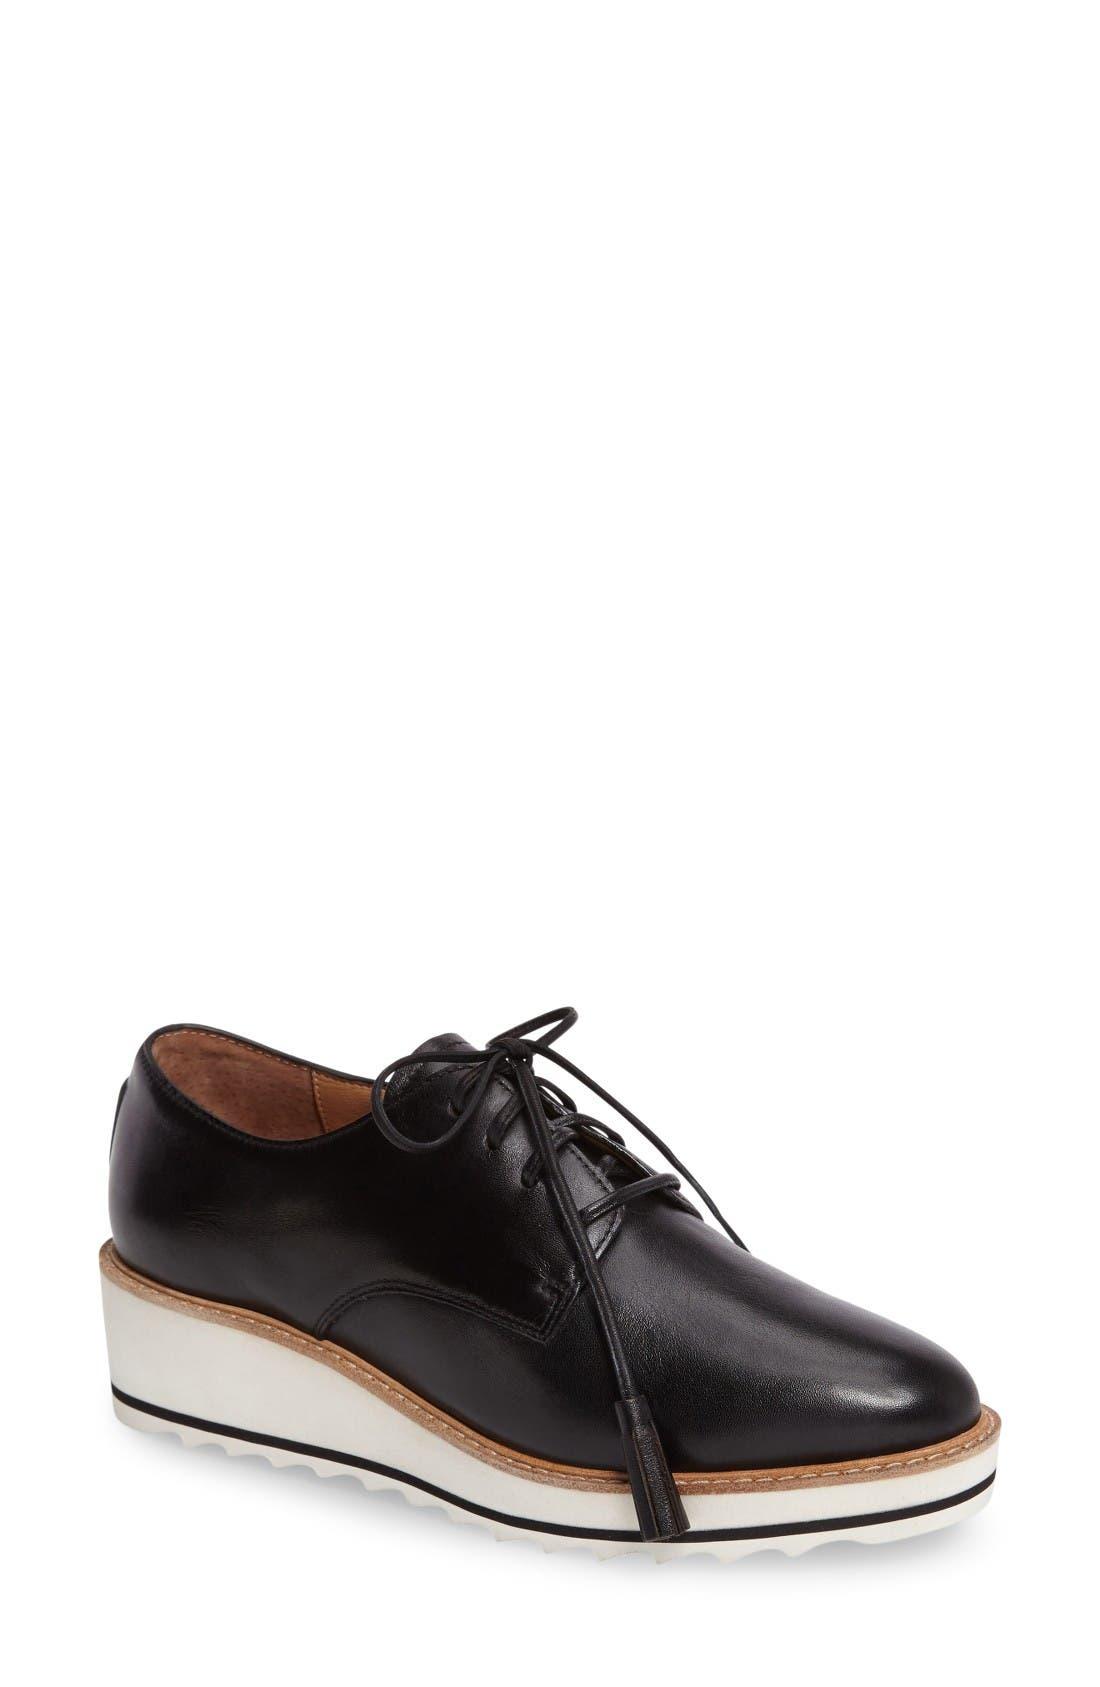 Marlo Platform Oxford,                         Main,                         color, Black Leather